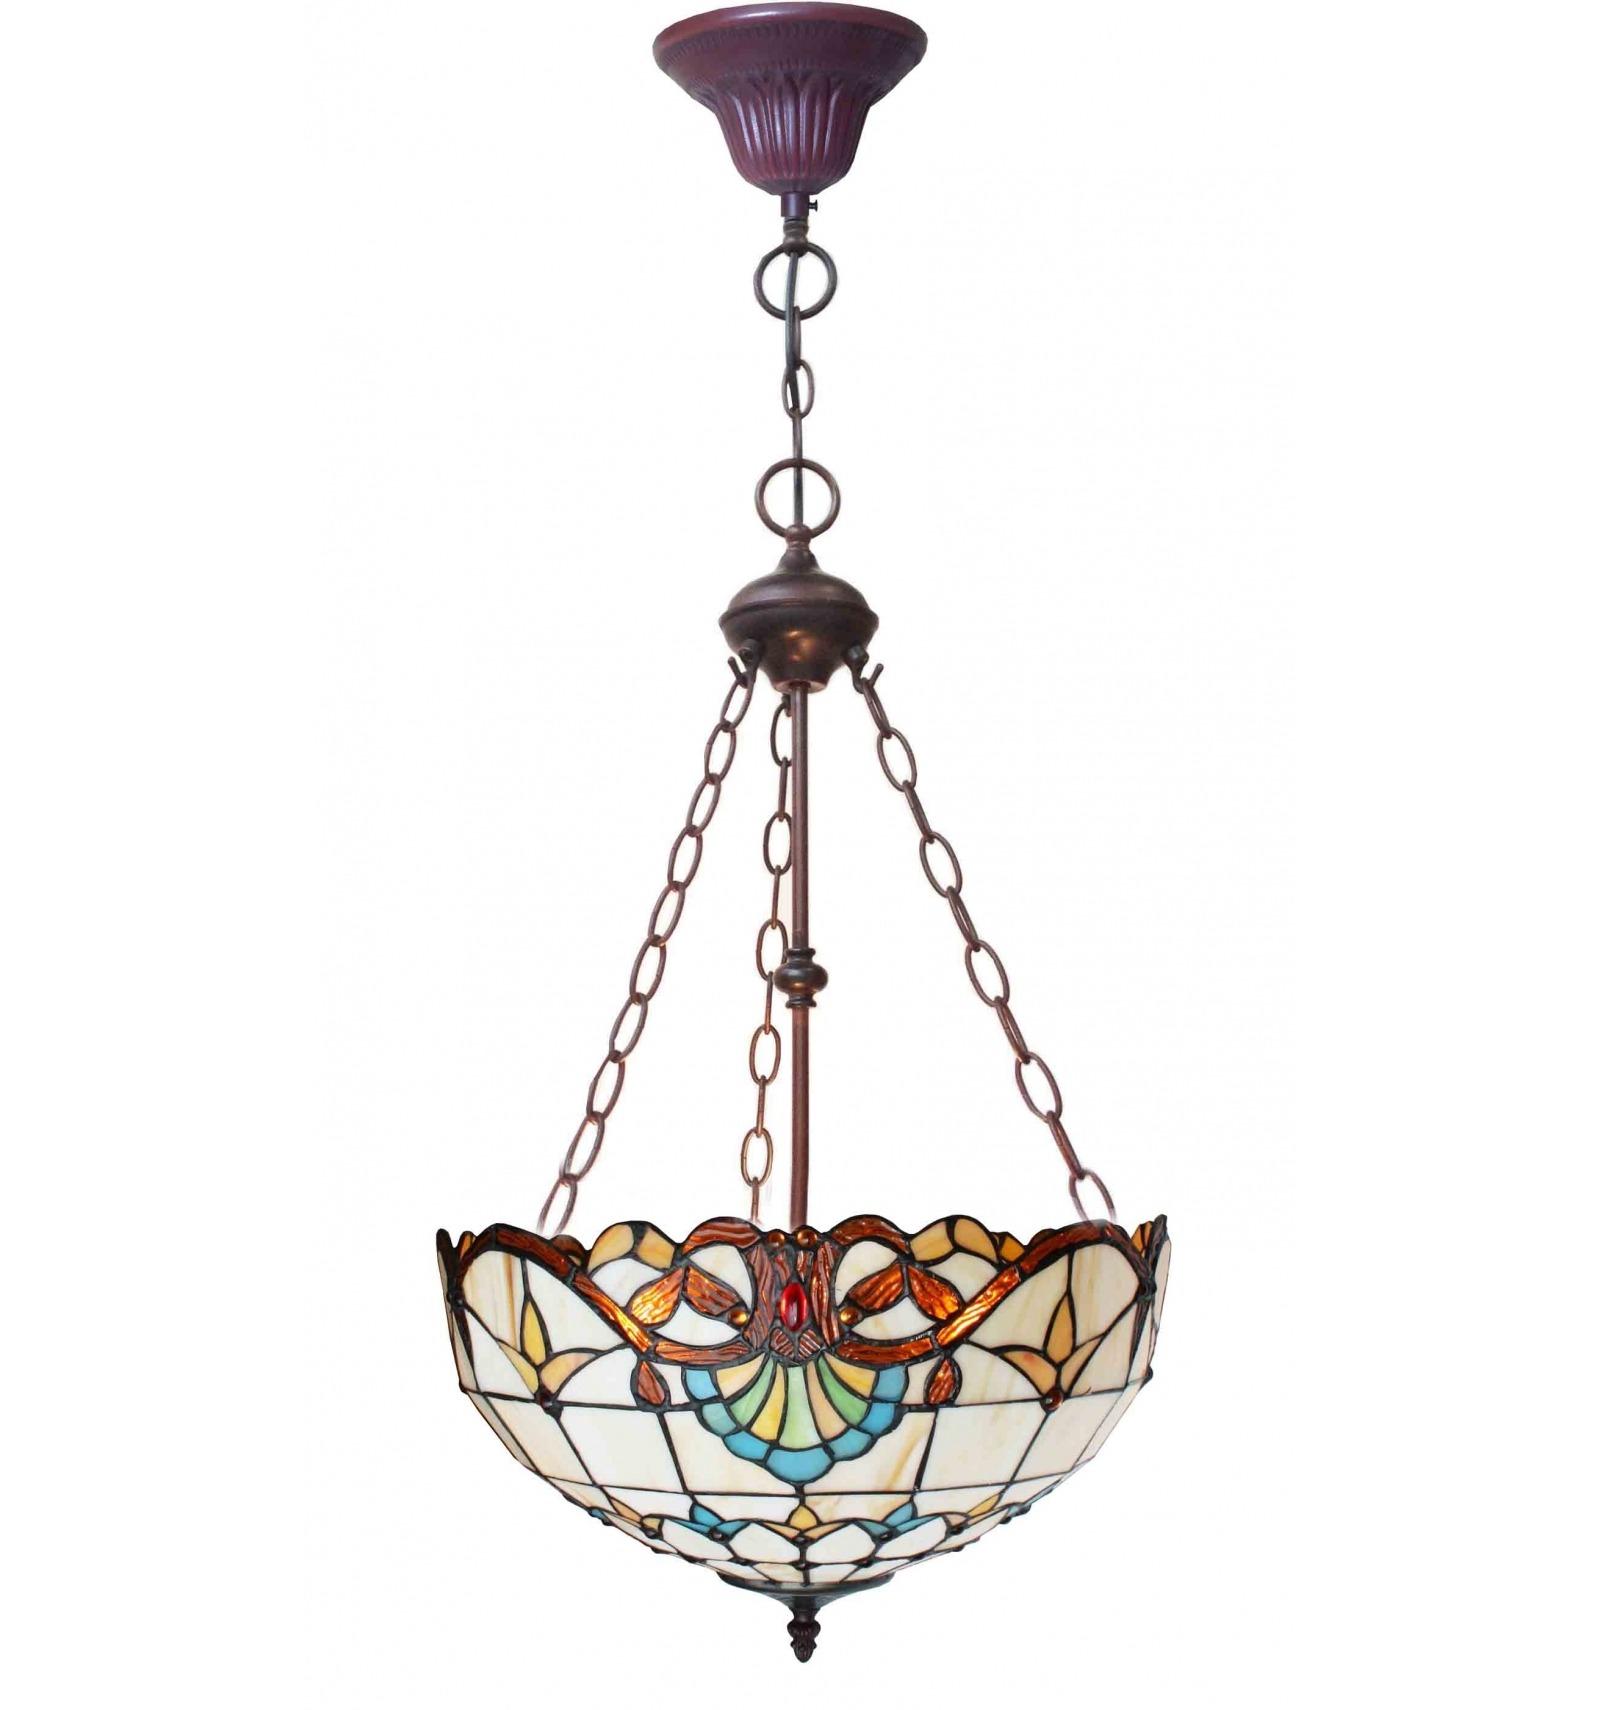 Lampadario Tiffany - Serie Paris in stile liberty